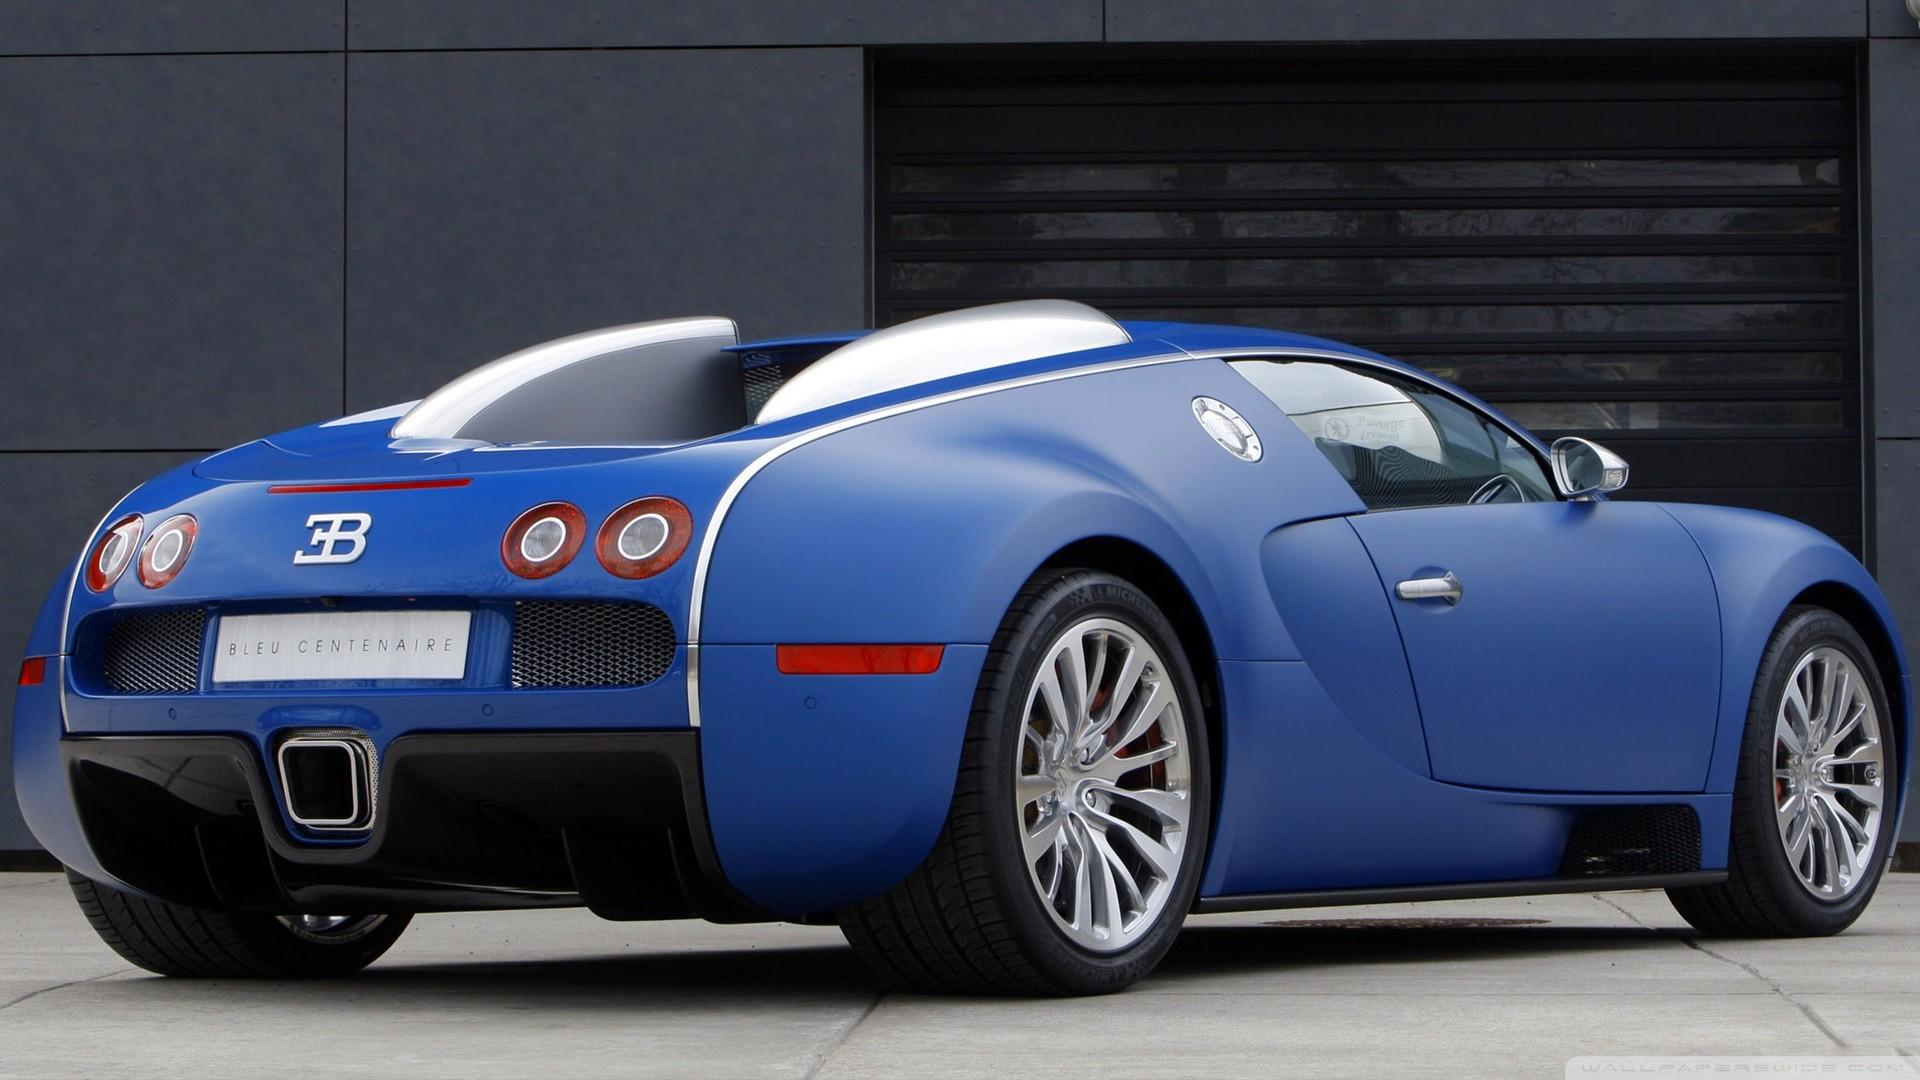 supercars hd wallpapers 1080p download,land vehicle,vehicle,car,sports car,bugatti veyron